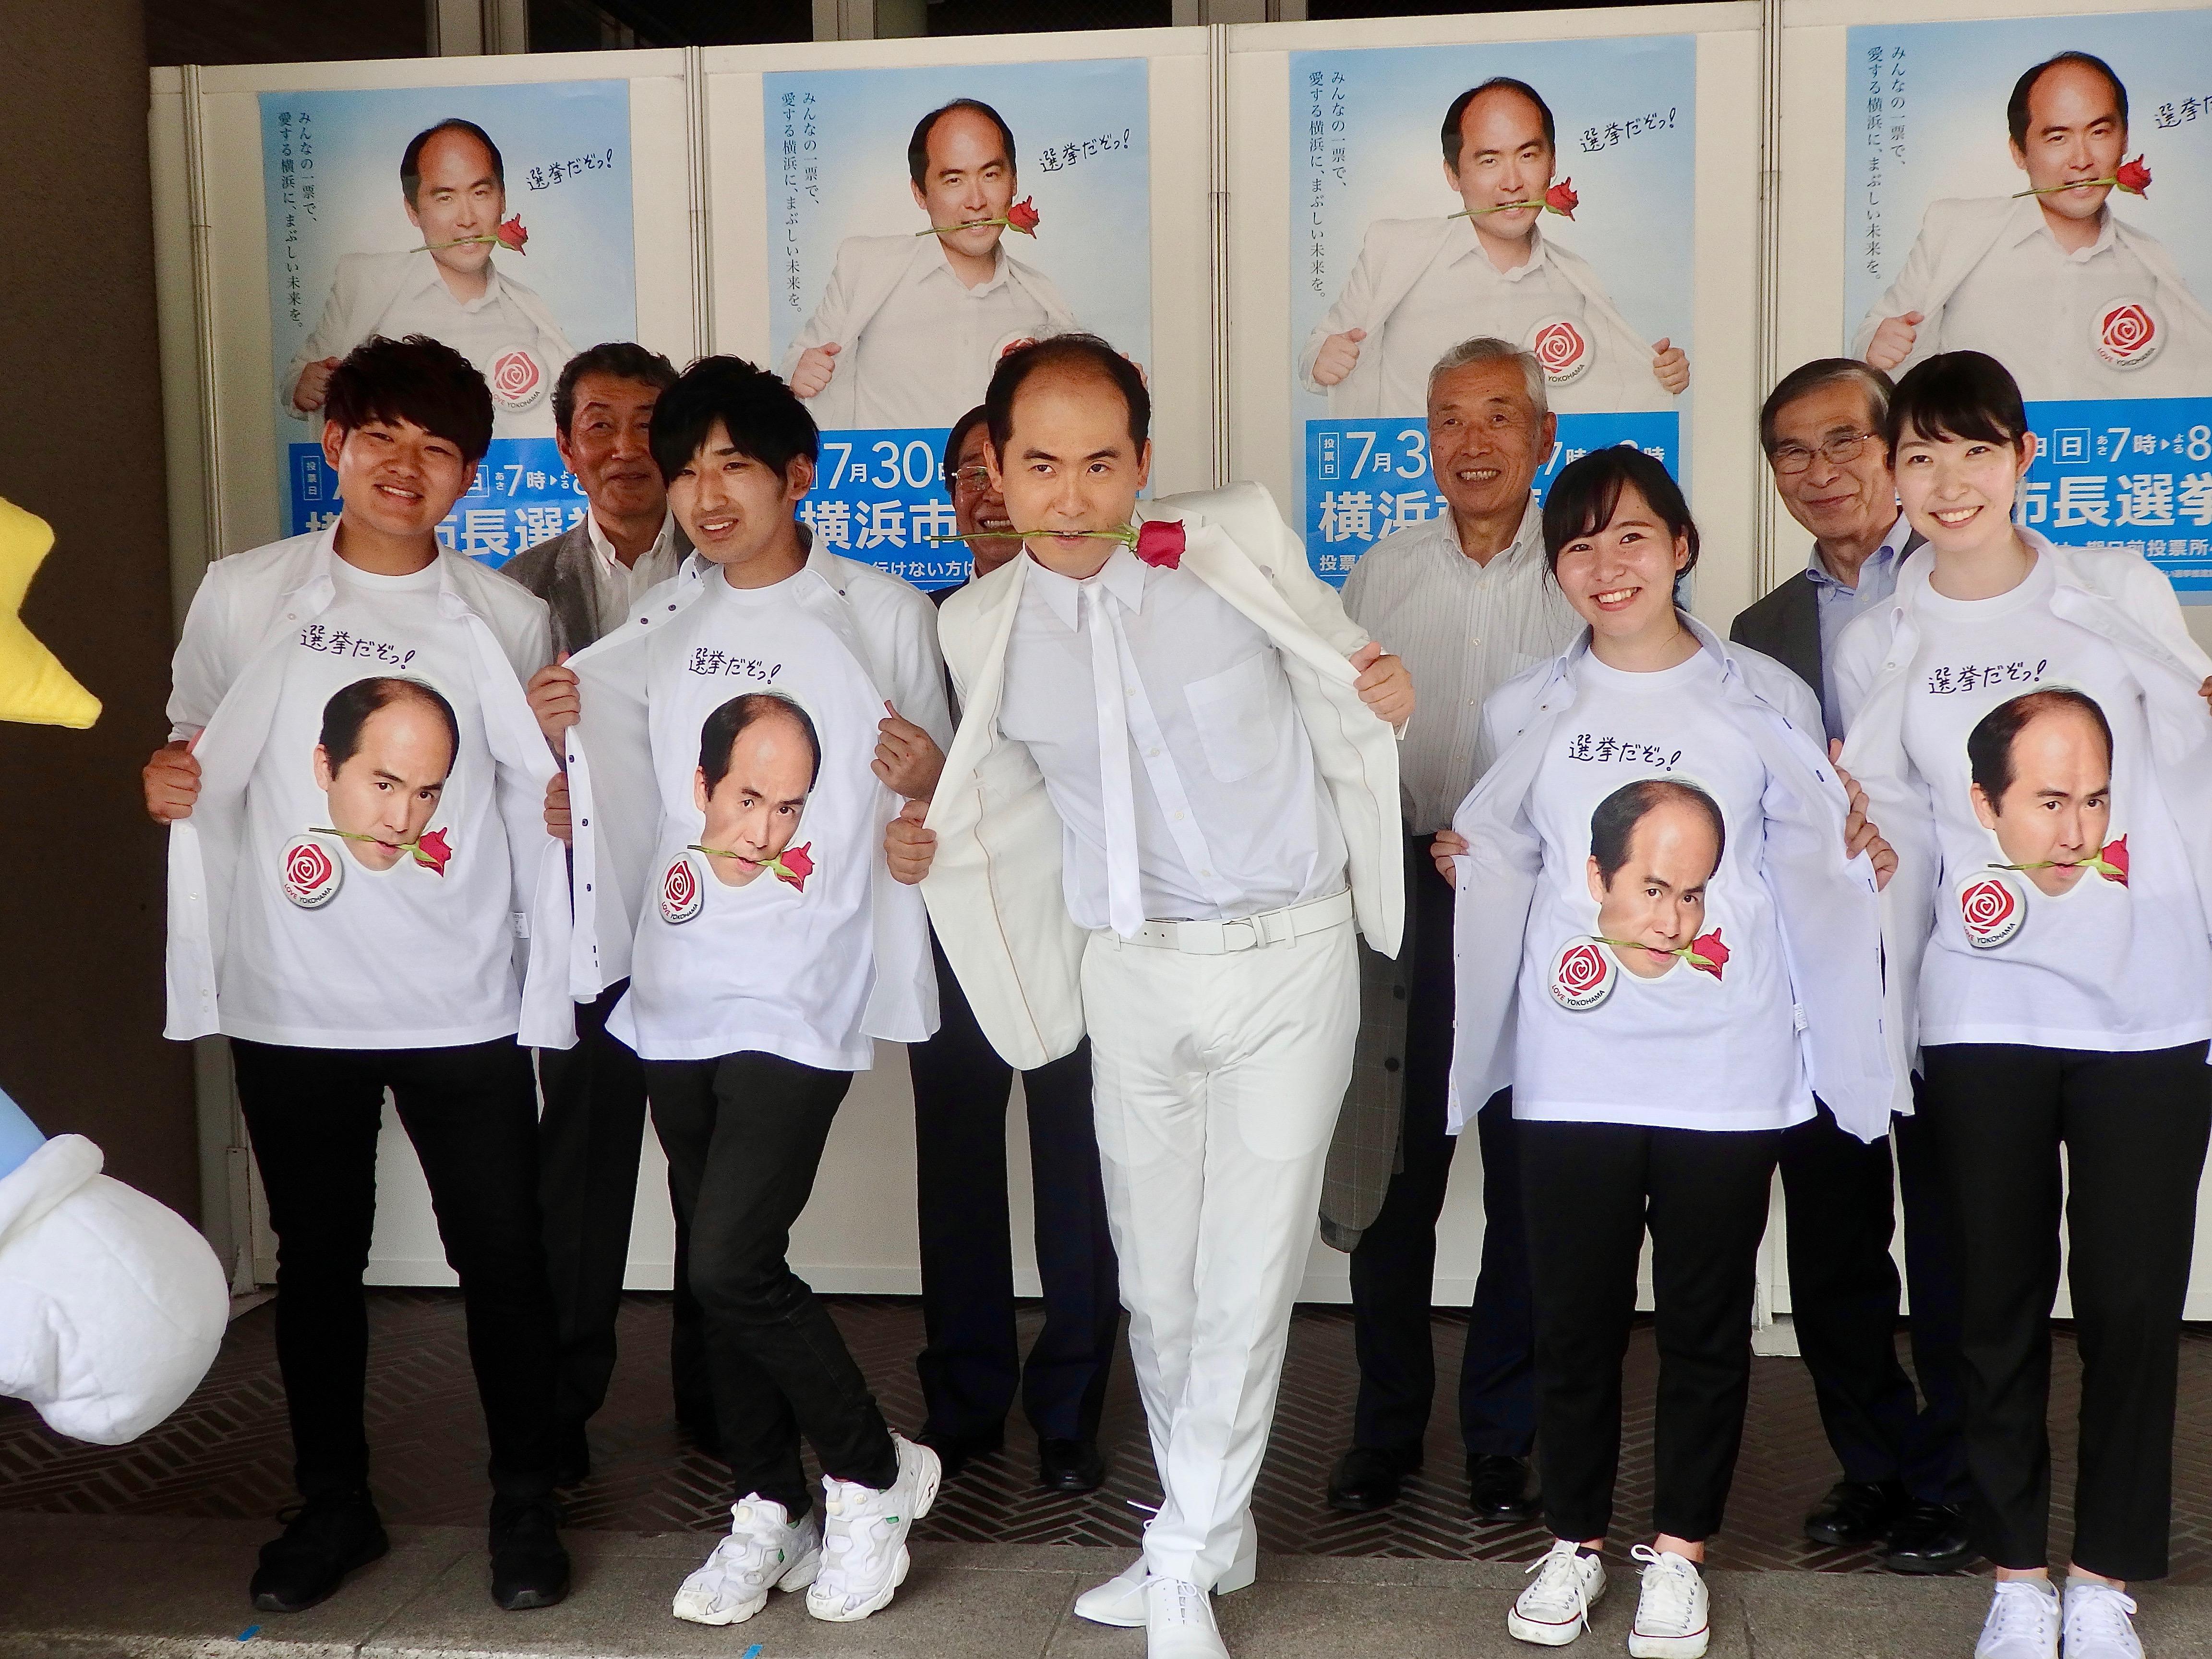 http://news.yoshimoto.co.jp/20170716163651-9af963ade9e30d37b13195a1e2b94a0ee928452e.jpg